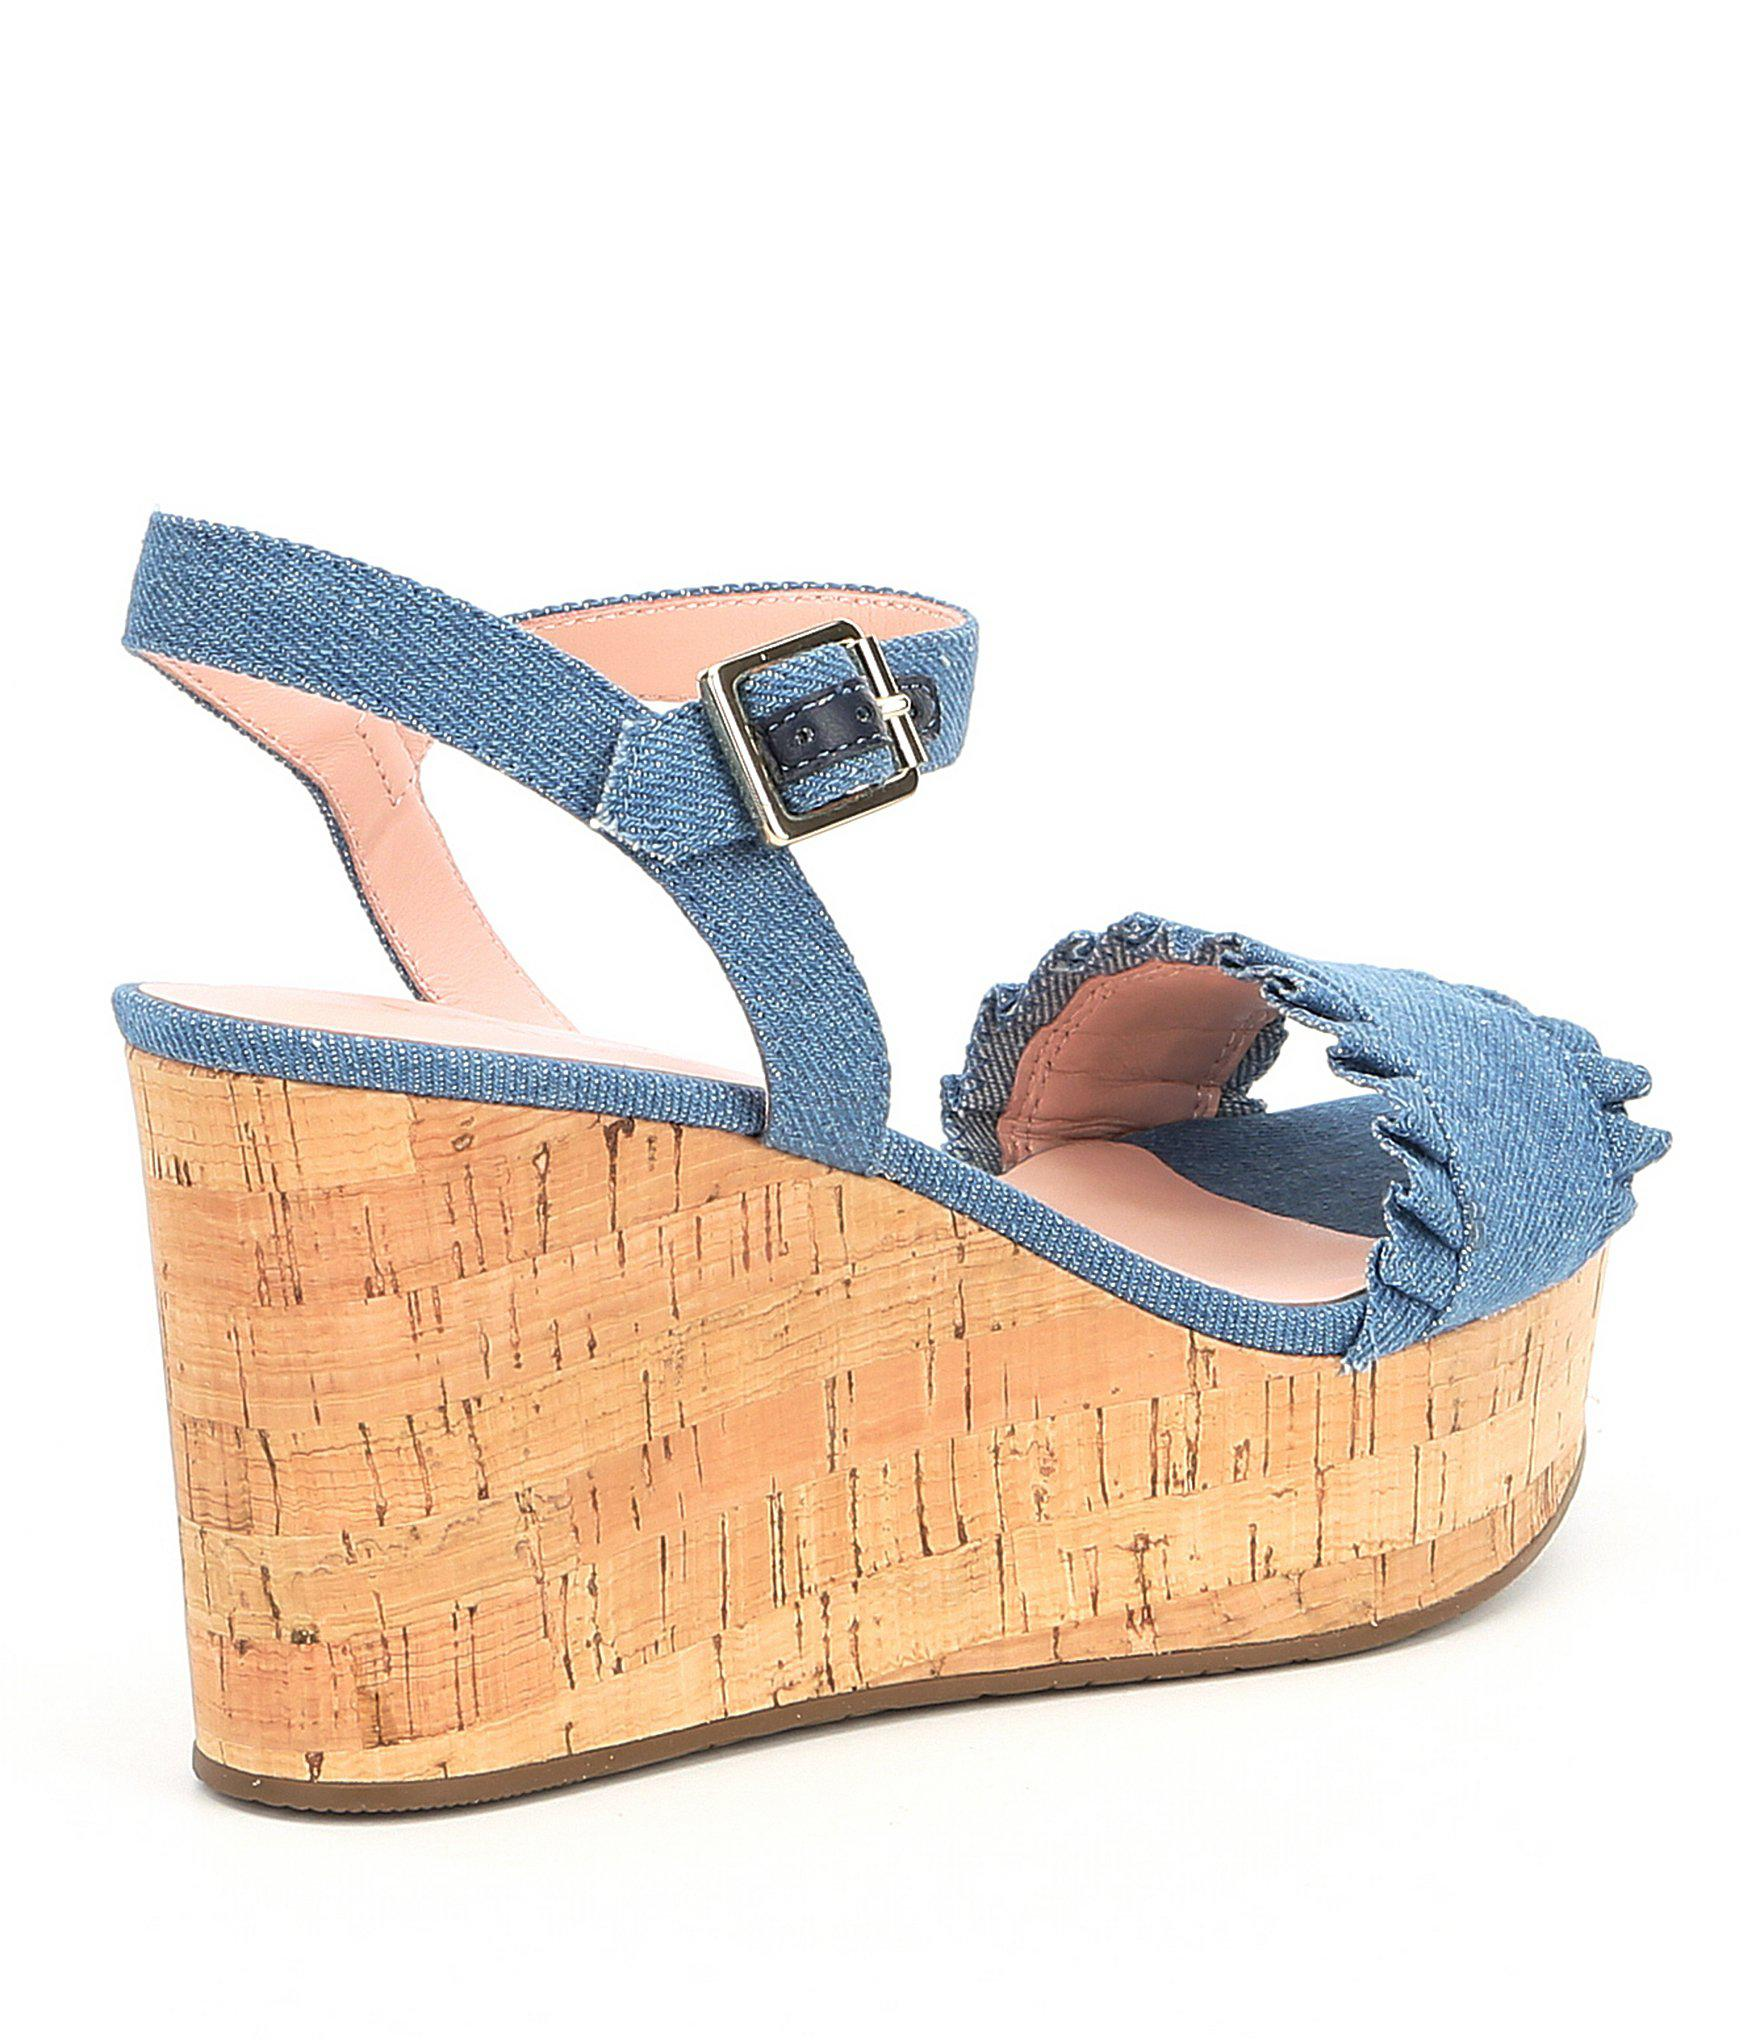 a1f85ec96cf Lyst - Kate Spade Tomas Denim Ruffle Detail Wedge Sandals in Blue